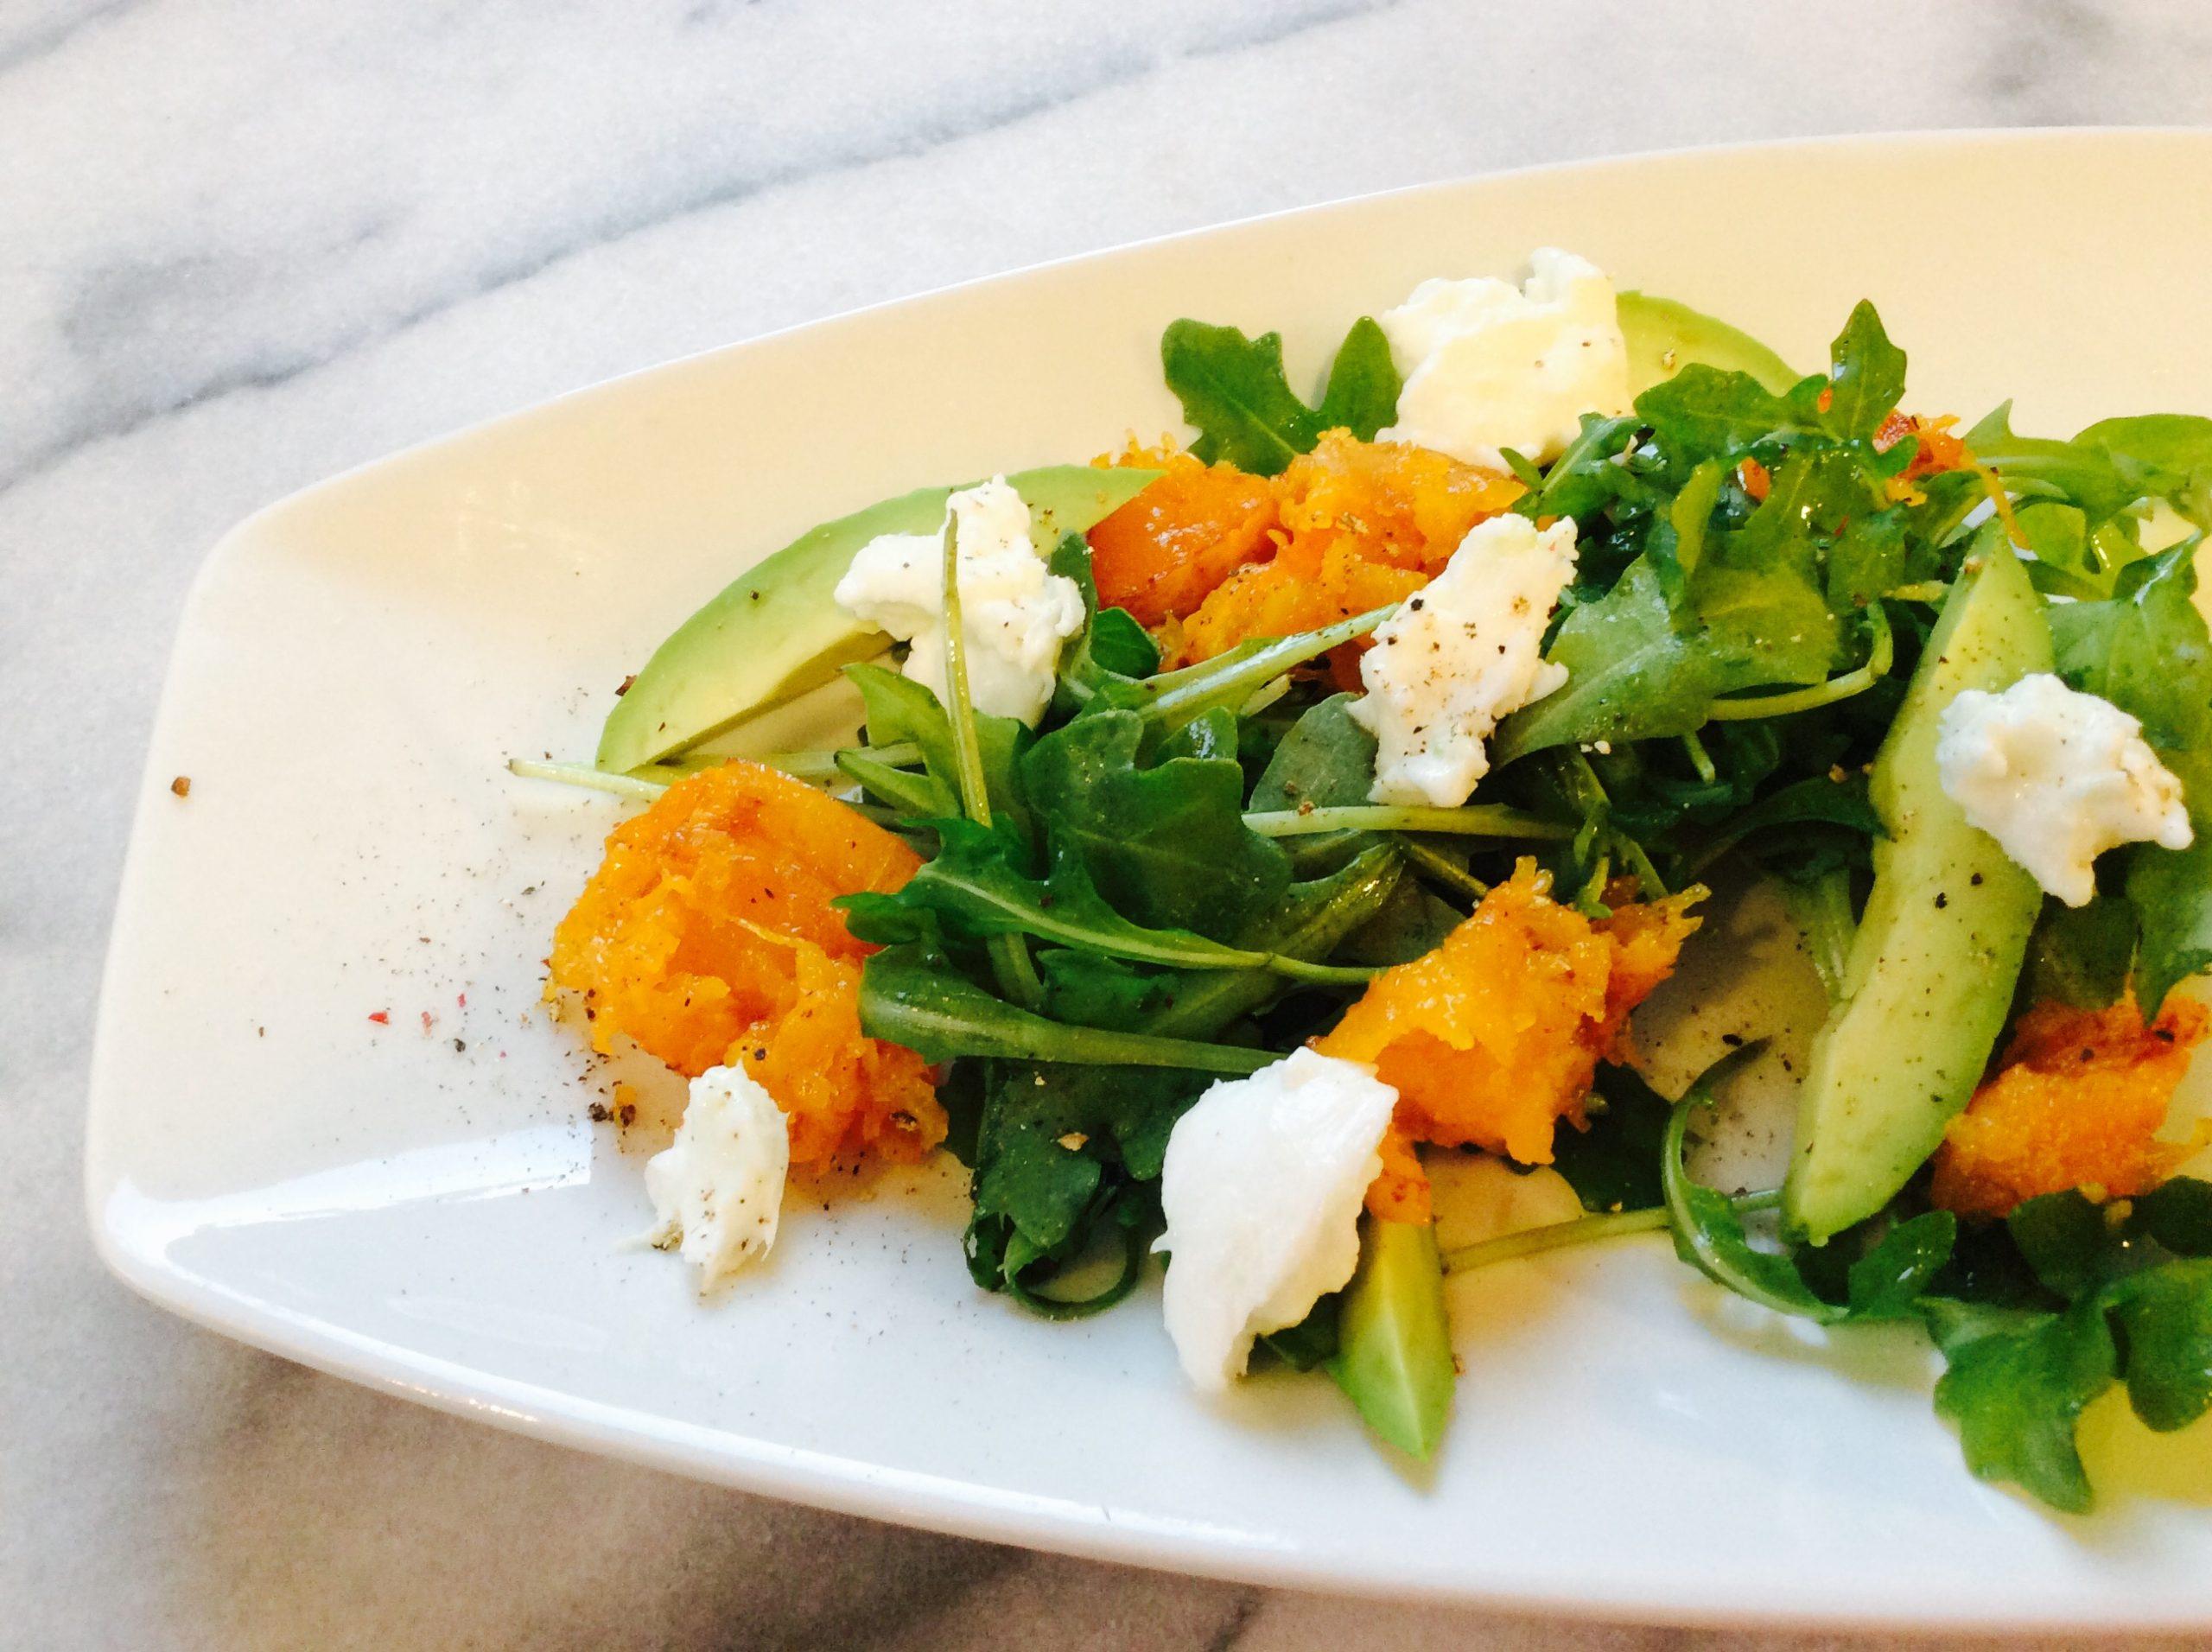 #recette #recettesalade #salade